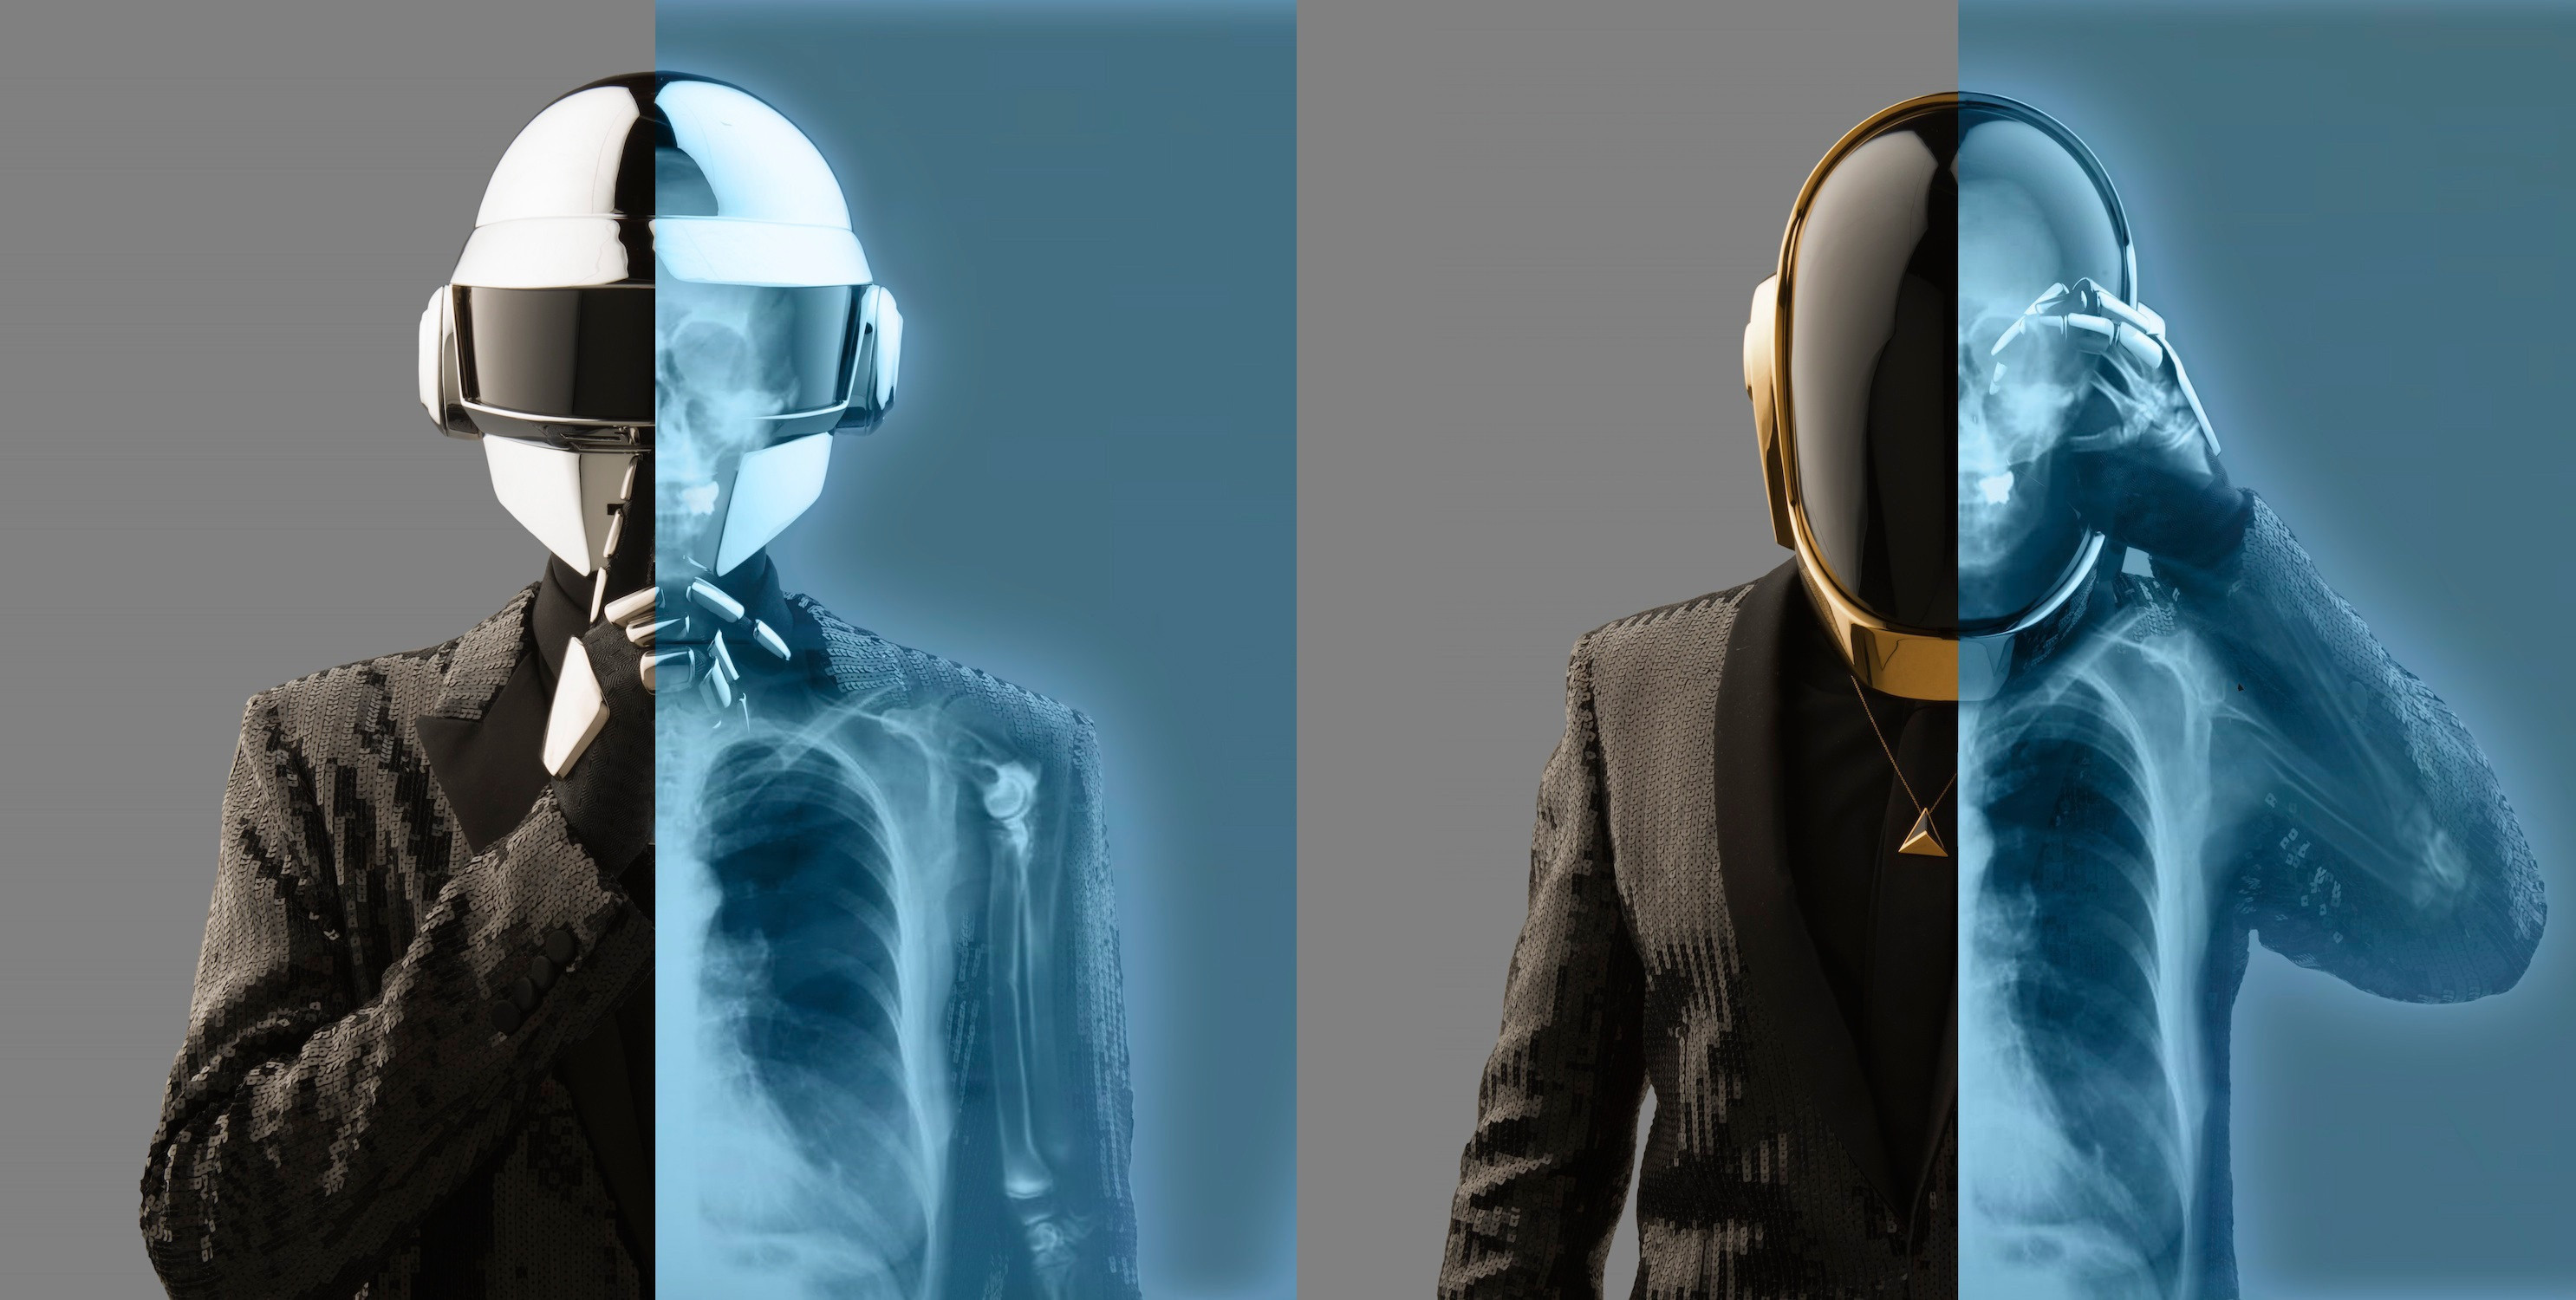 Daft Punk Band French Music Guy Manuel De Homem Christo Thomas Bangalter 2972x1500